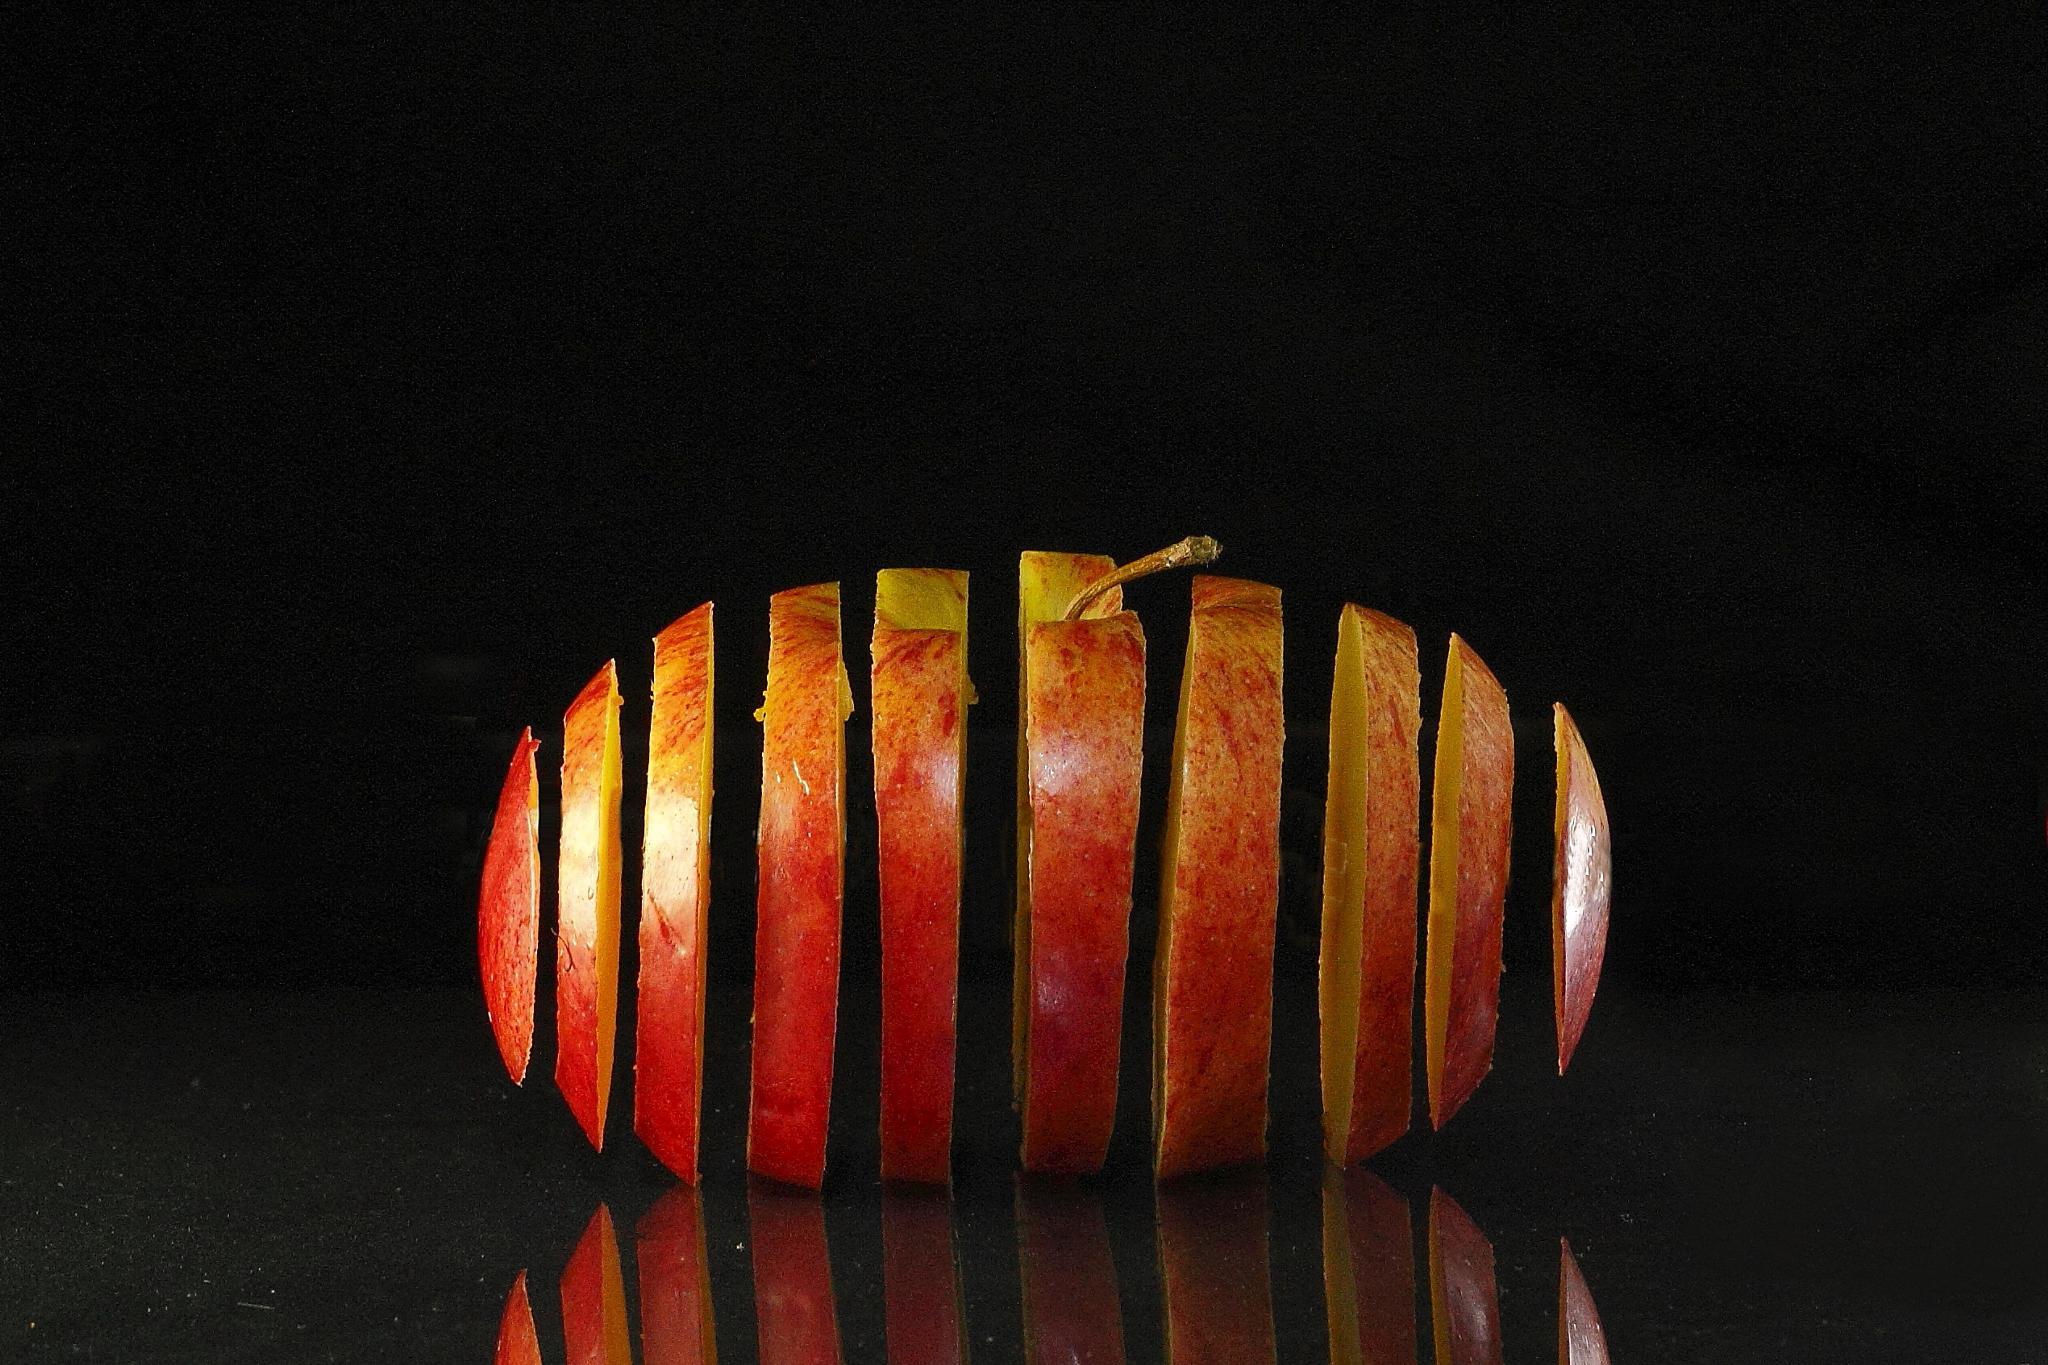 A for Apple by jkjainu